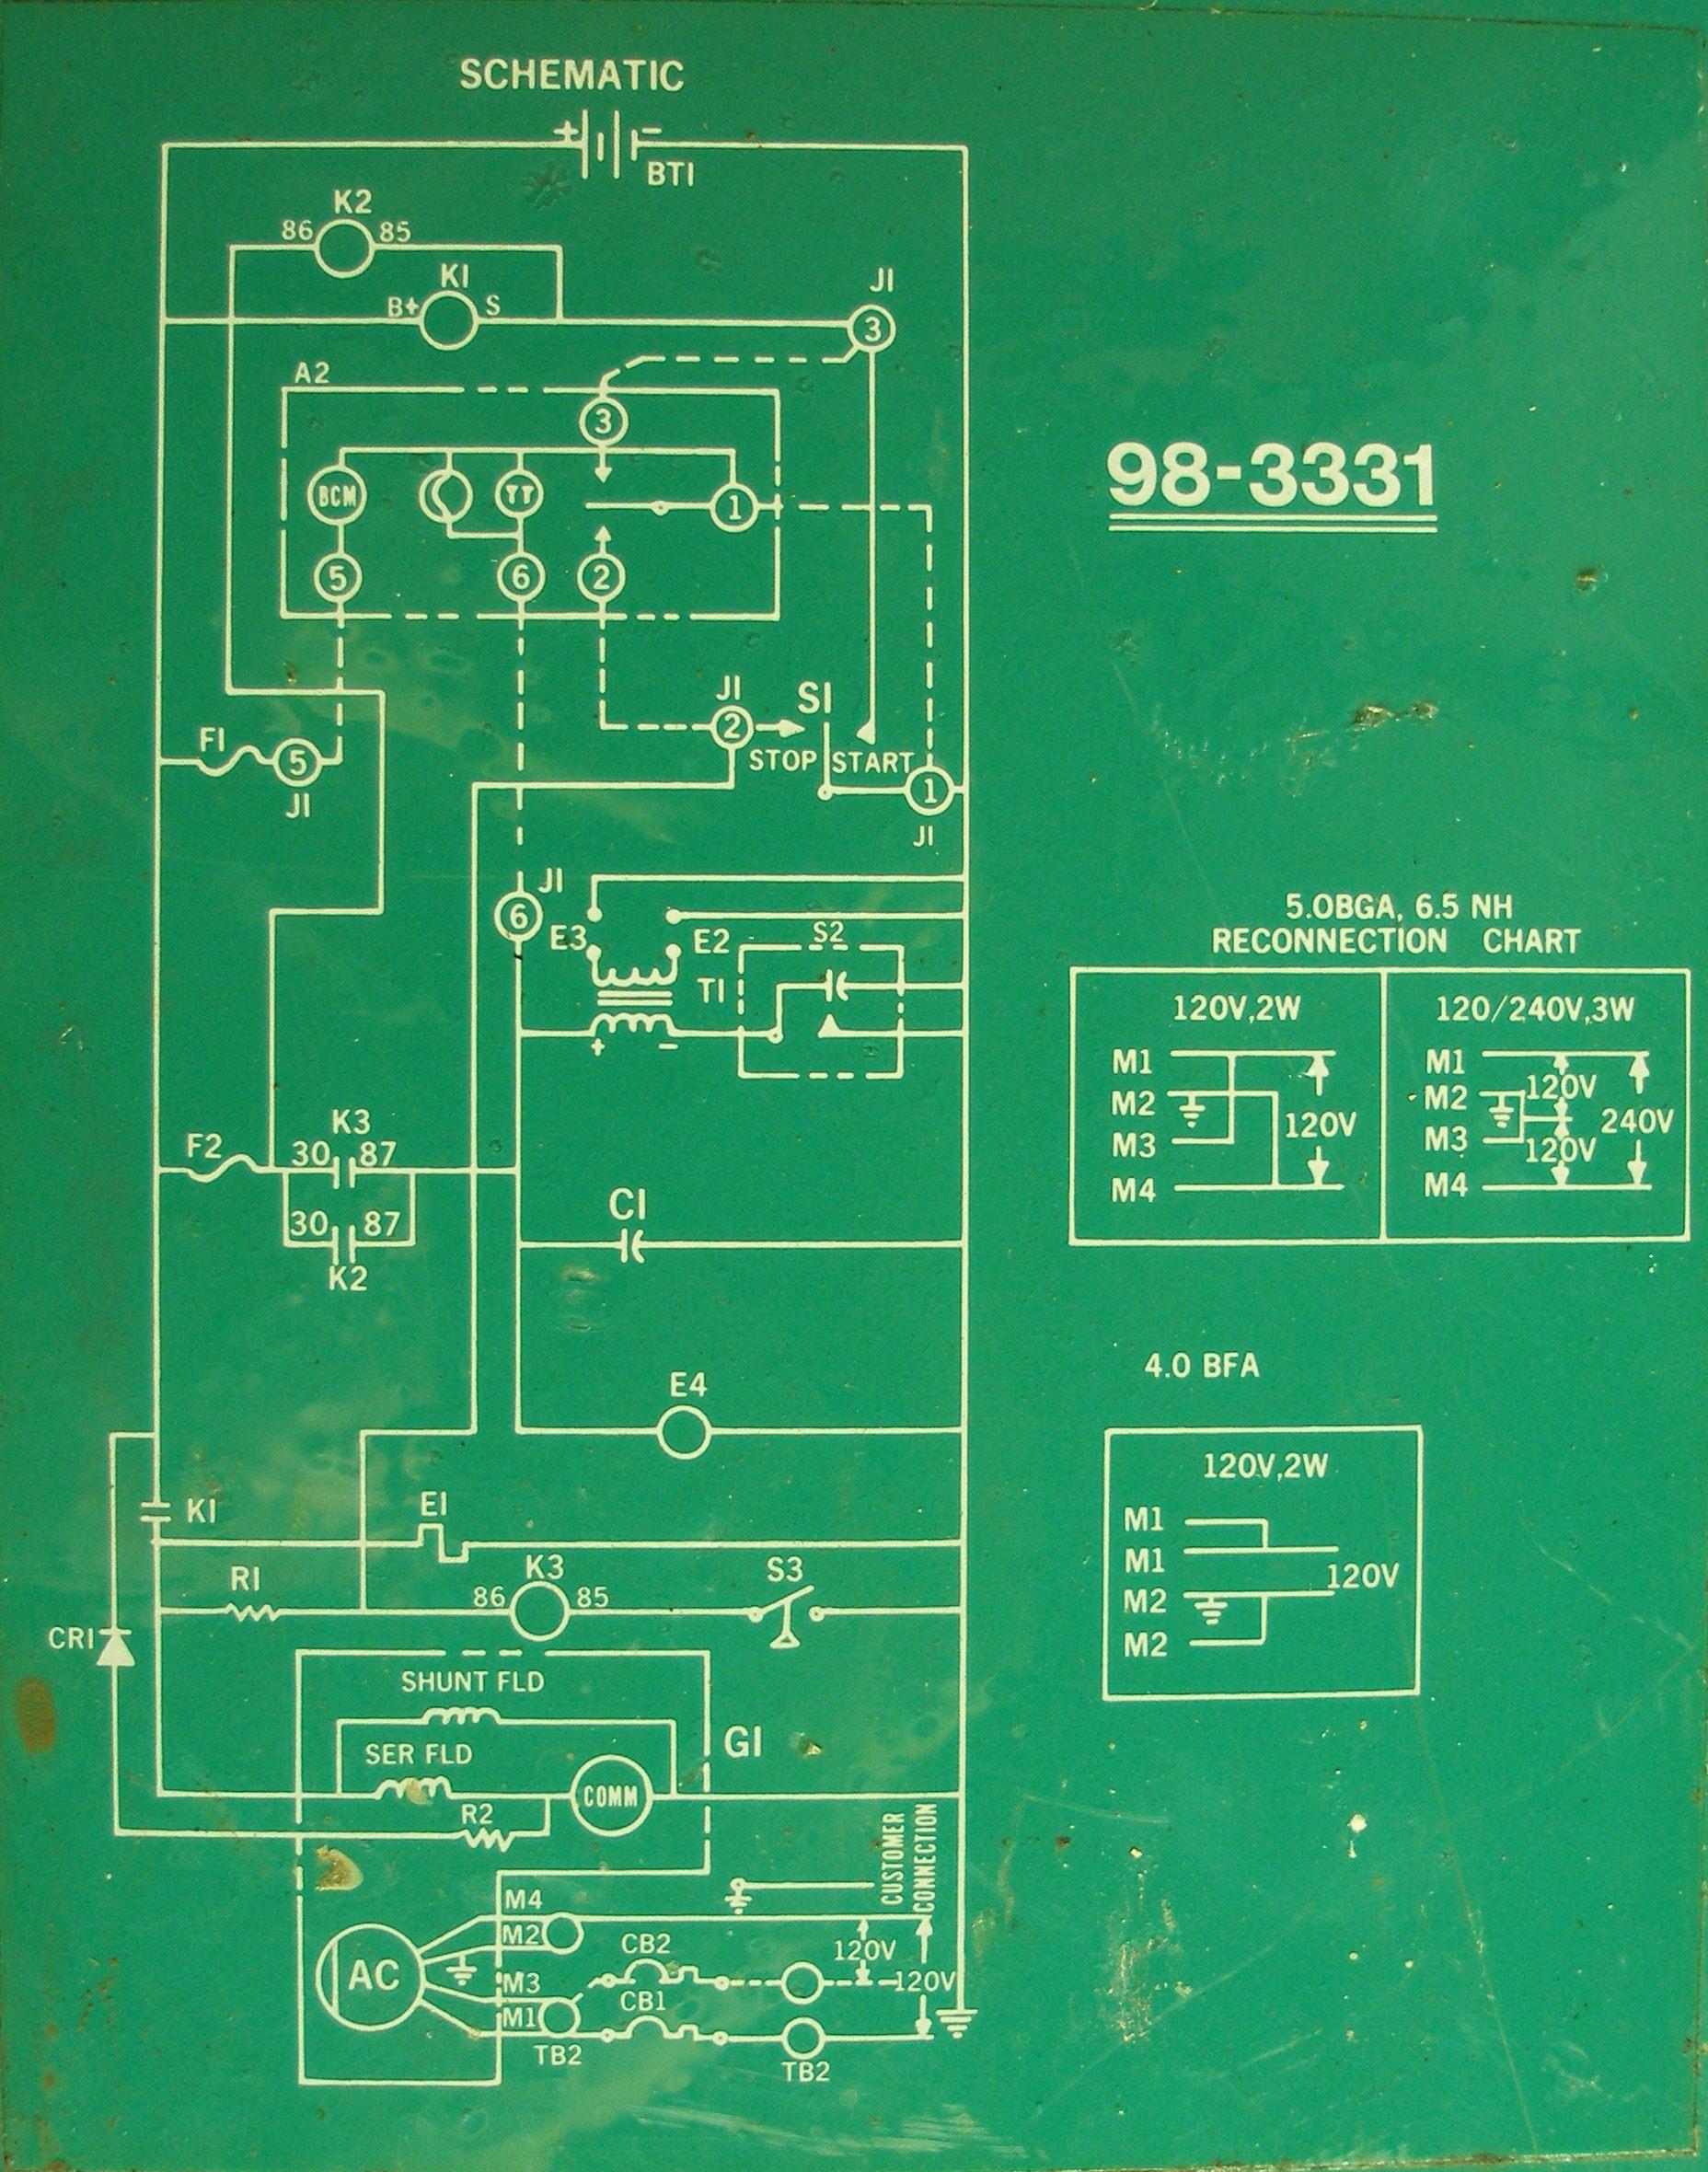 Onan Genset Wiring Diagram | Best Wiring Library - Onan 4.0 Rv Genset Wiring Diagram